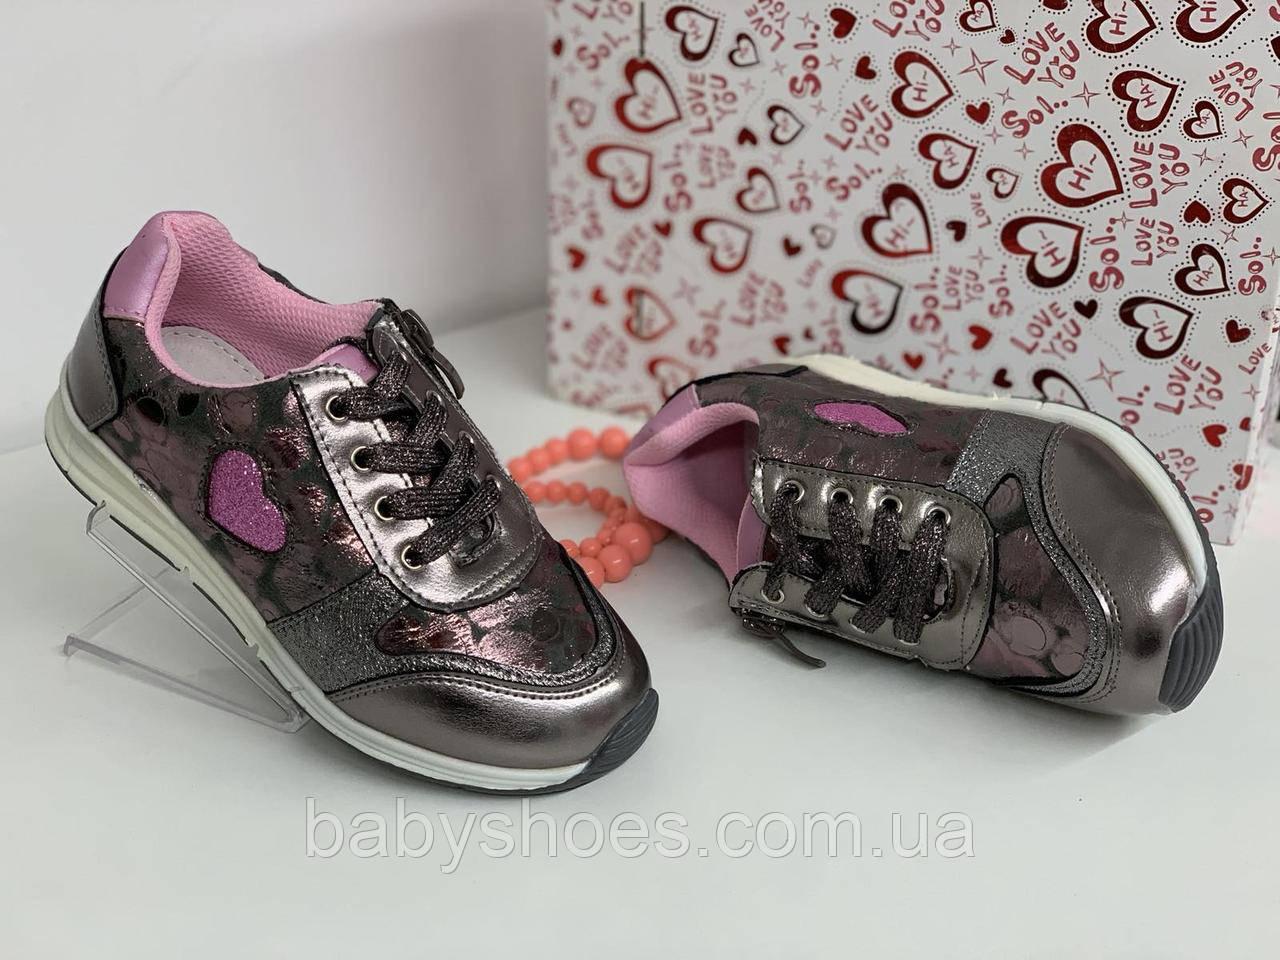 Кроссовки для девочки Солнце (Украина) р.28, 29 КД-200-з